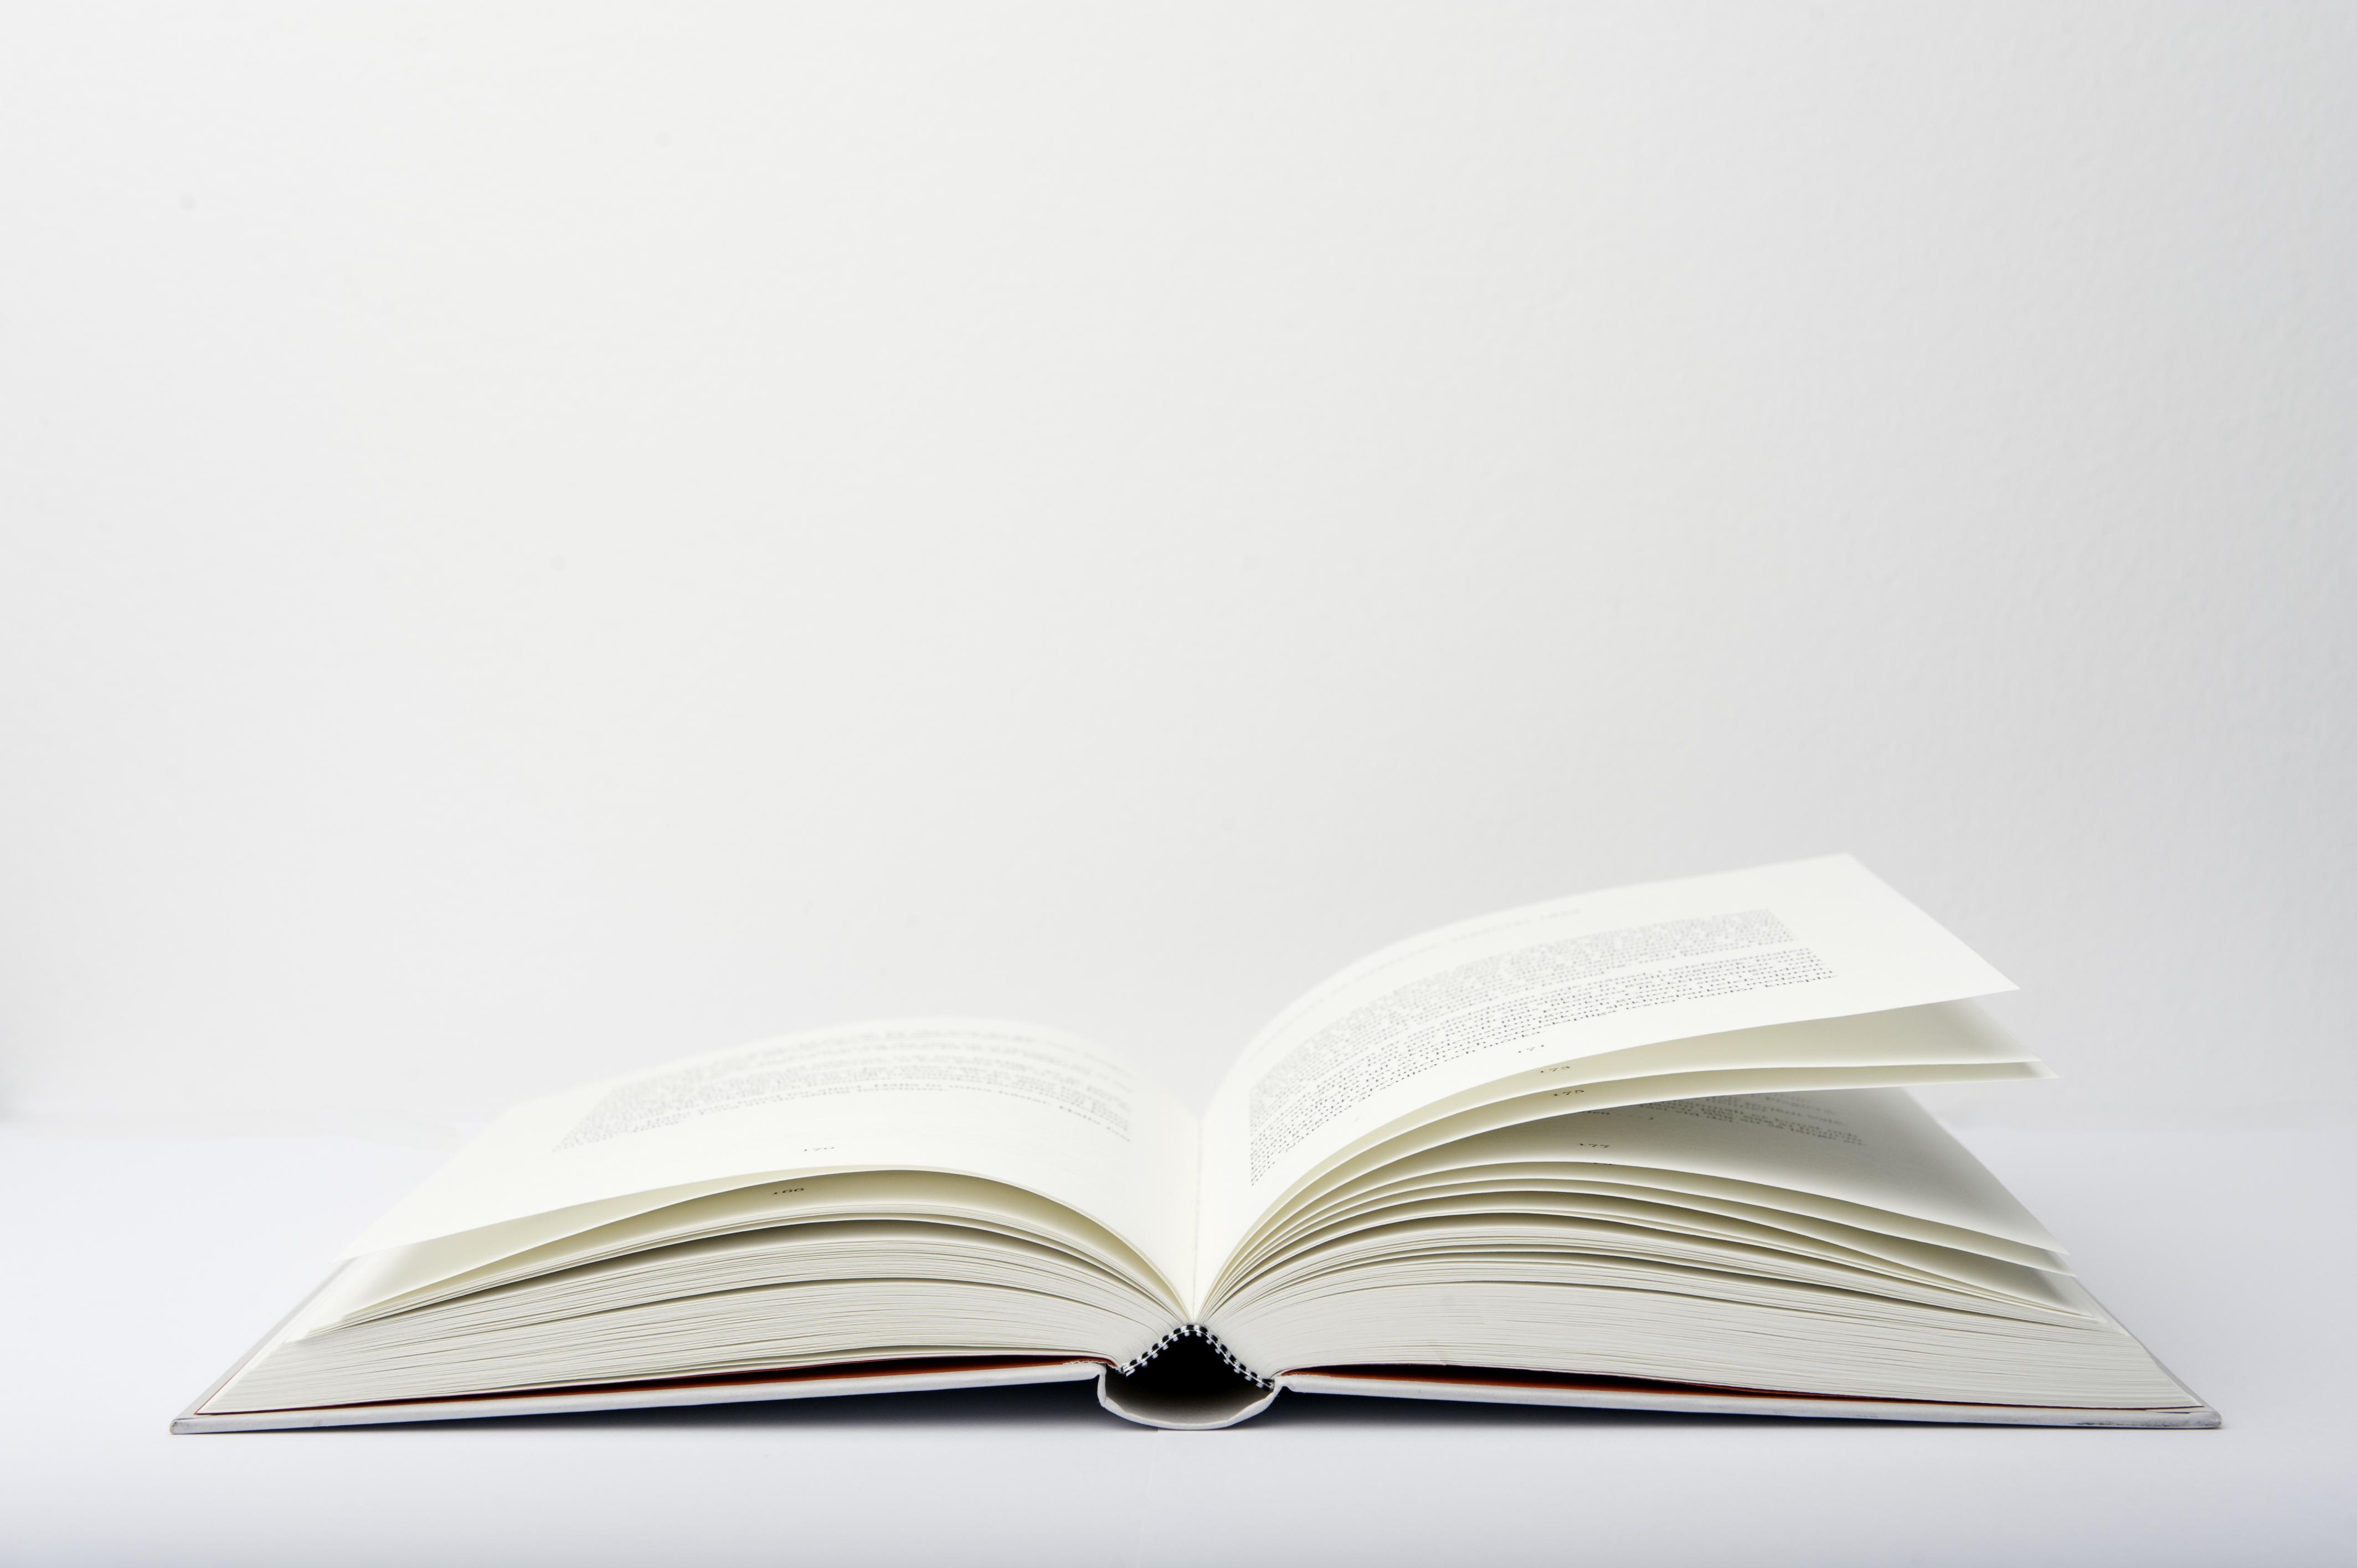 Husholdning bok én gratis